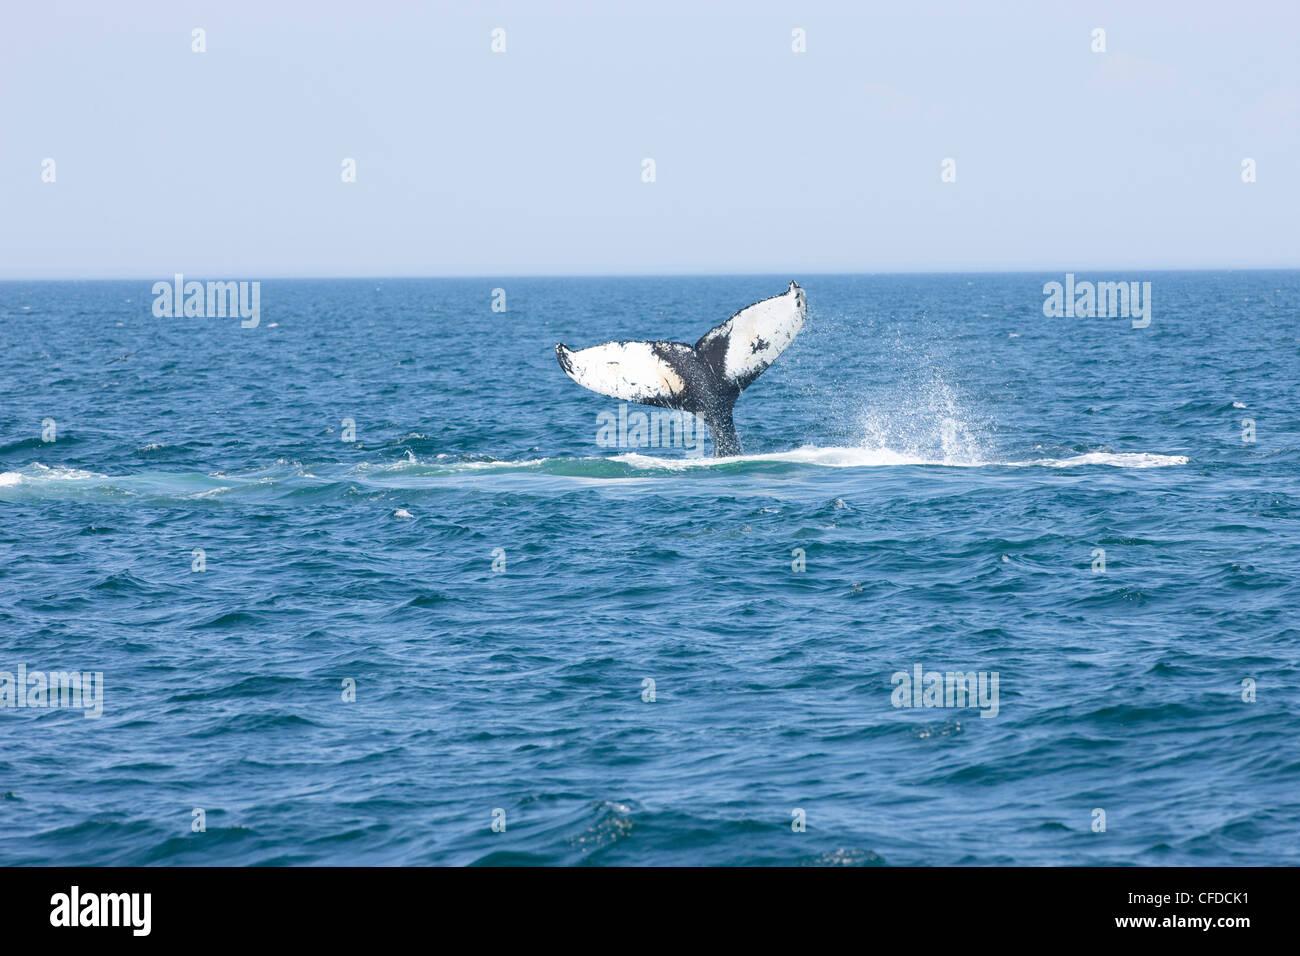 Humpback whale tail-slapping, (Megaptera novaeangliae) off Grand Manan Island, Bay of Fundy, New Brunswick, Canada Stock Photo